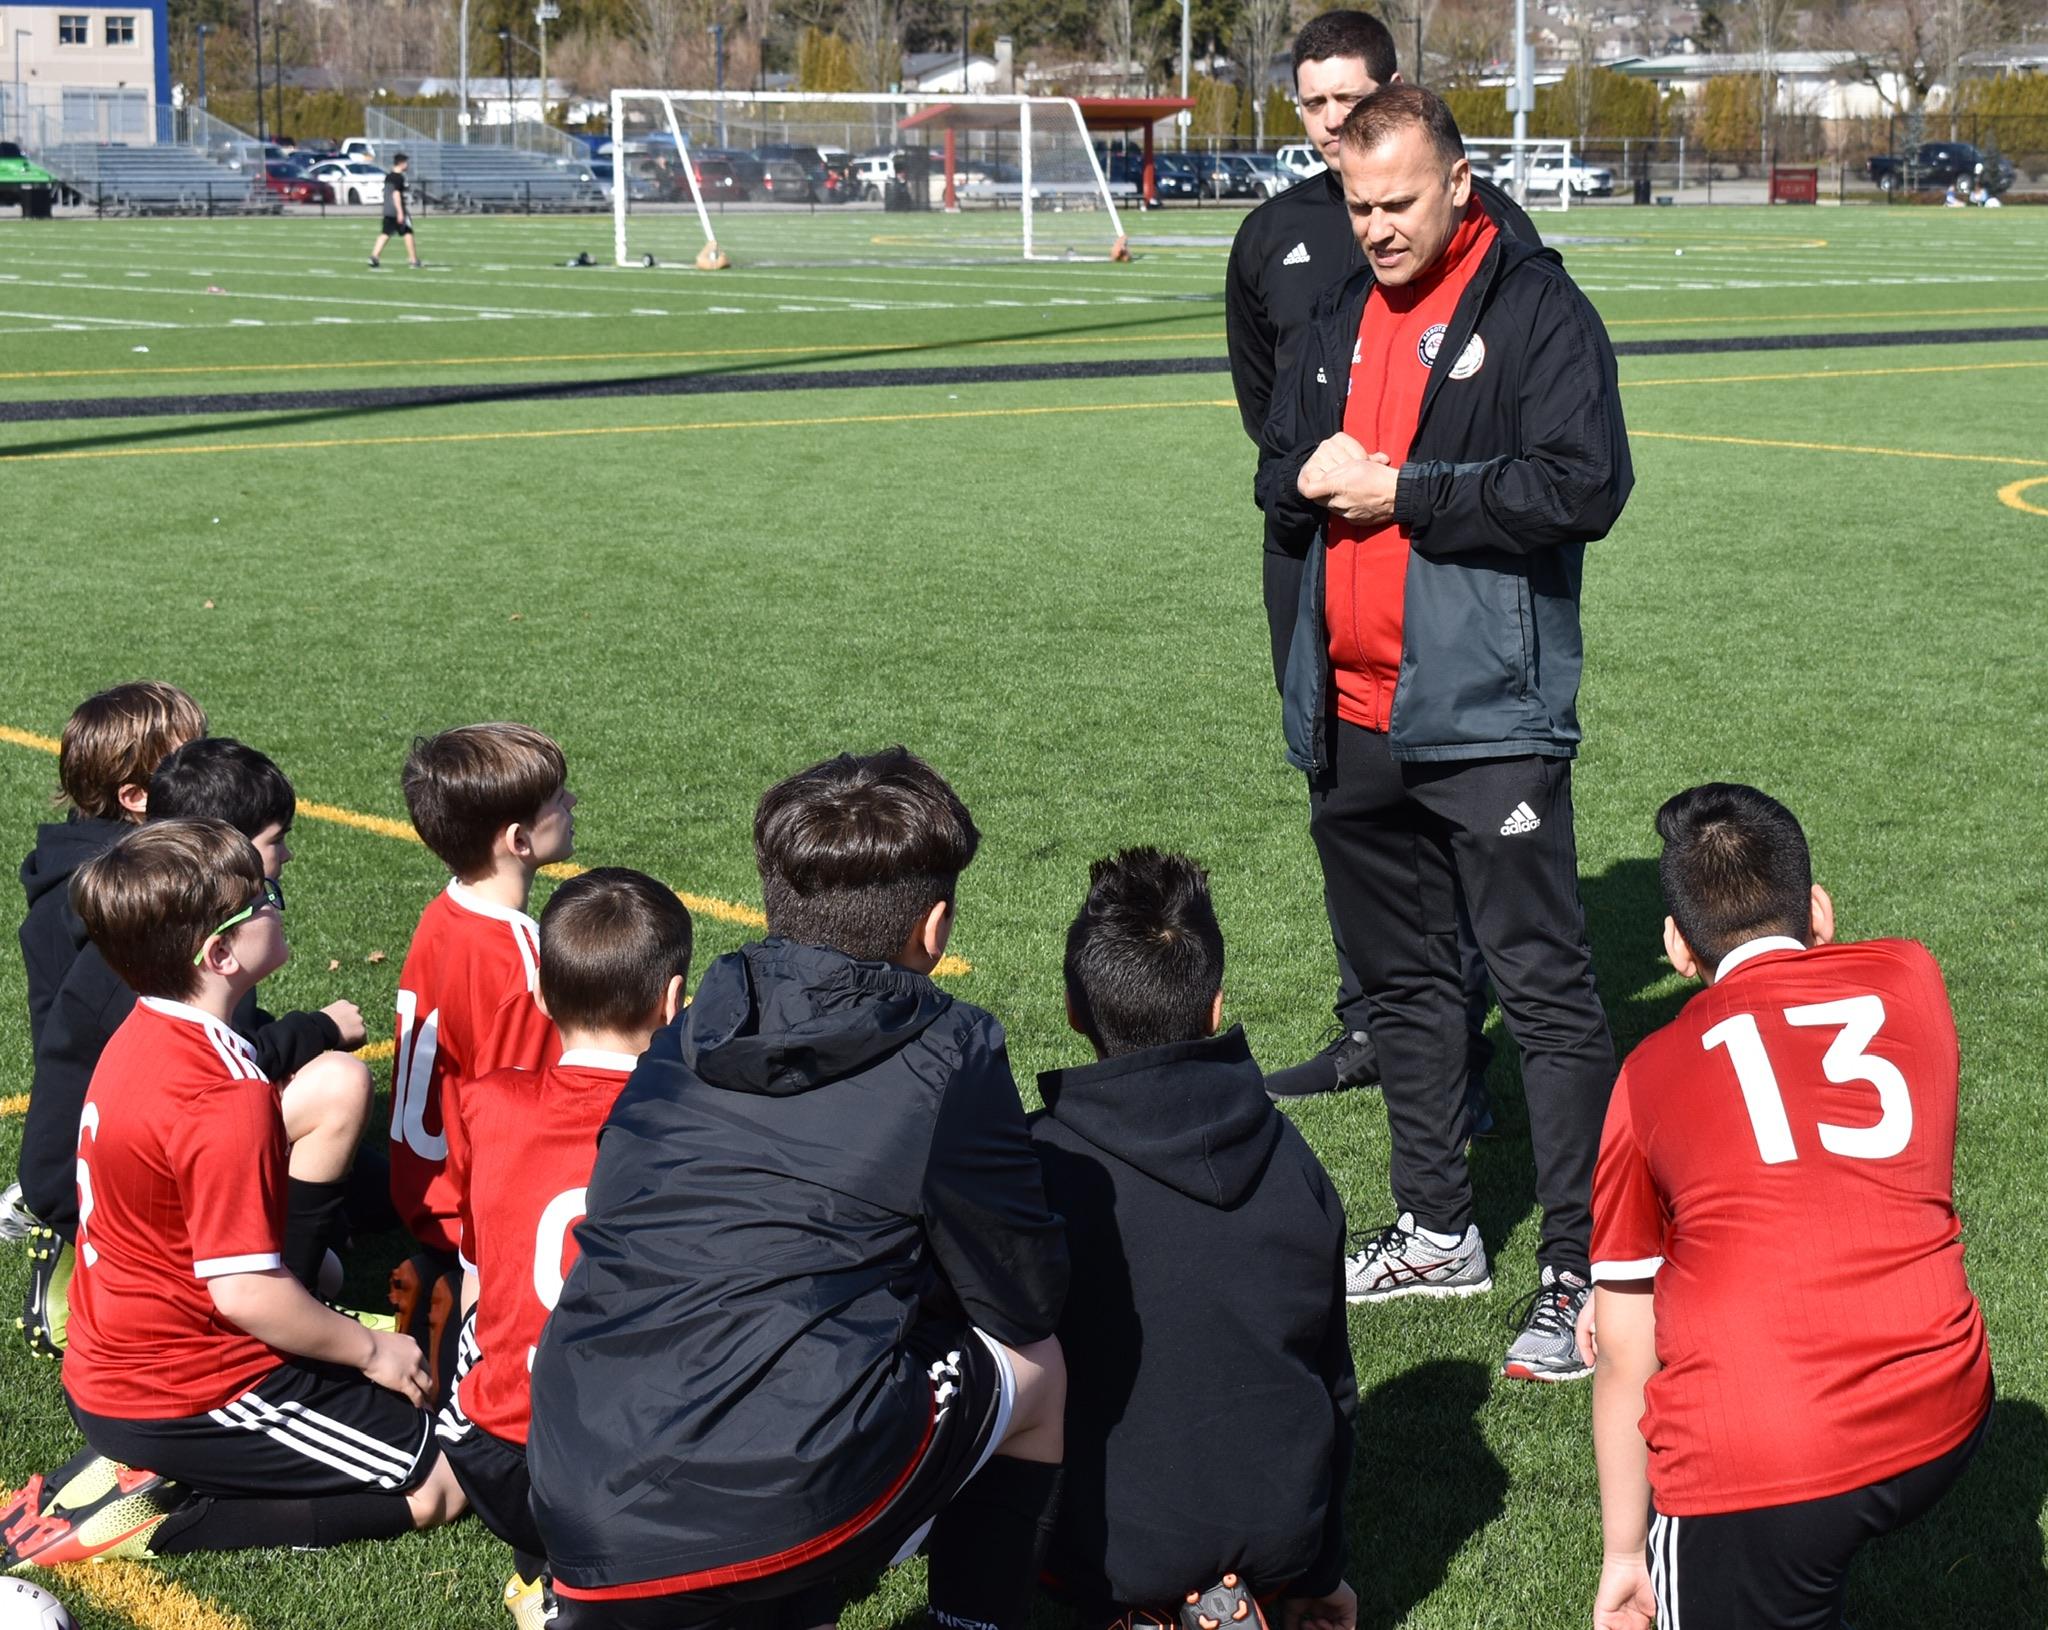 Soccer School in Abbotsford